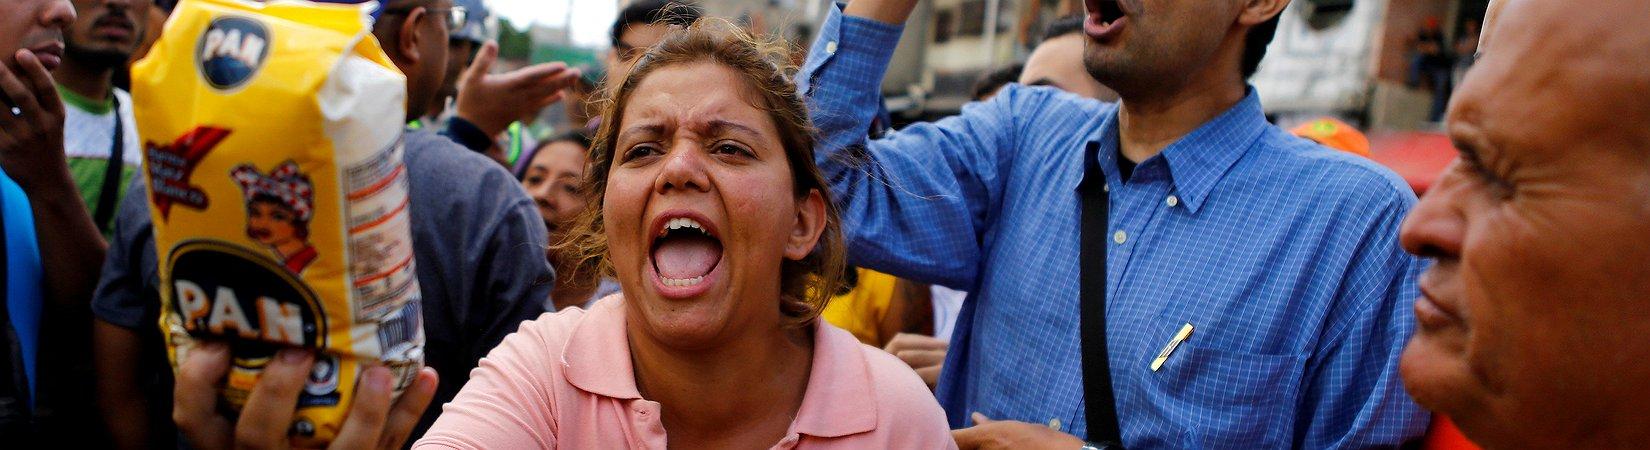 La hambruna se apodera de Venezuela